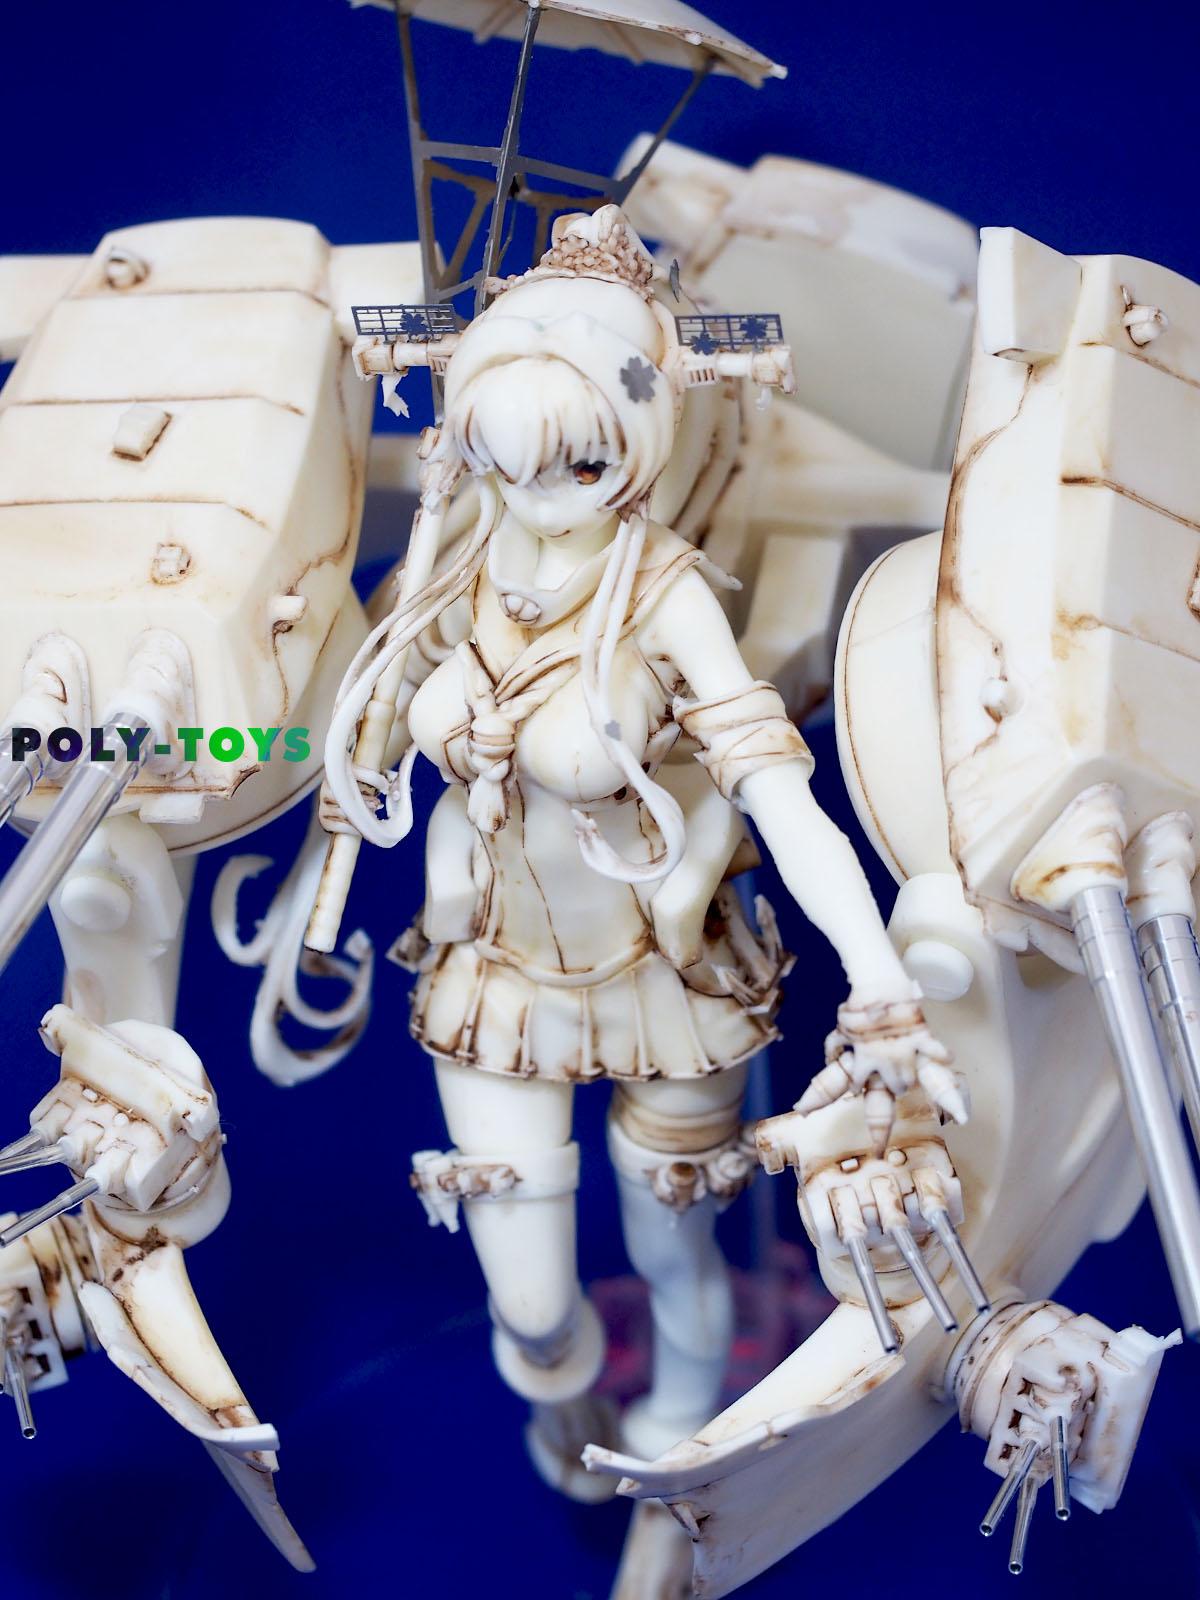 http://polytoys.boo.jp/poly-log2/yamatoIMG04.jpg